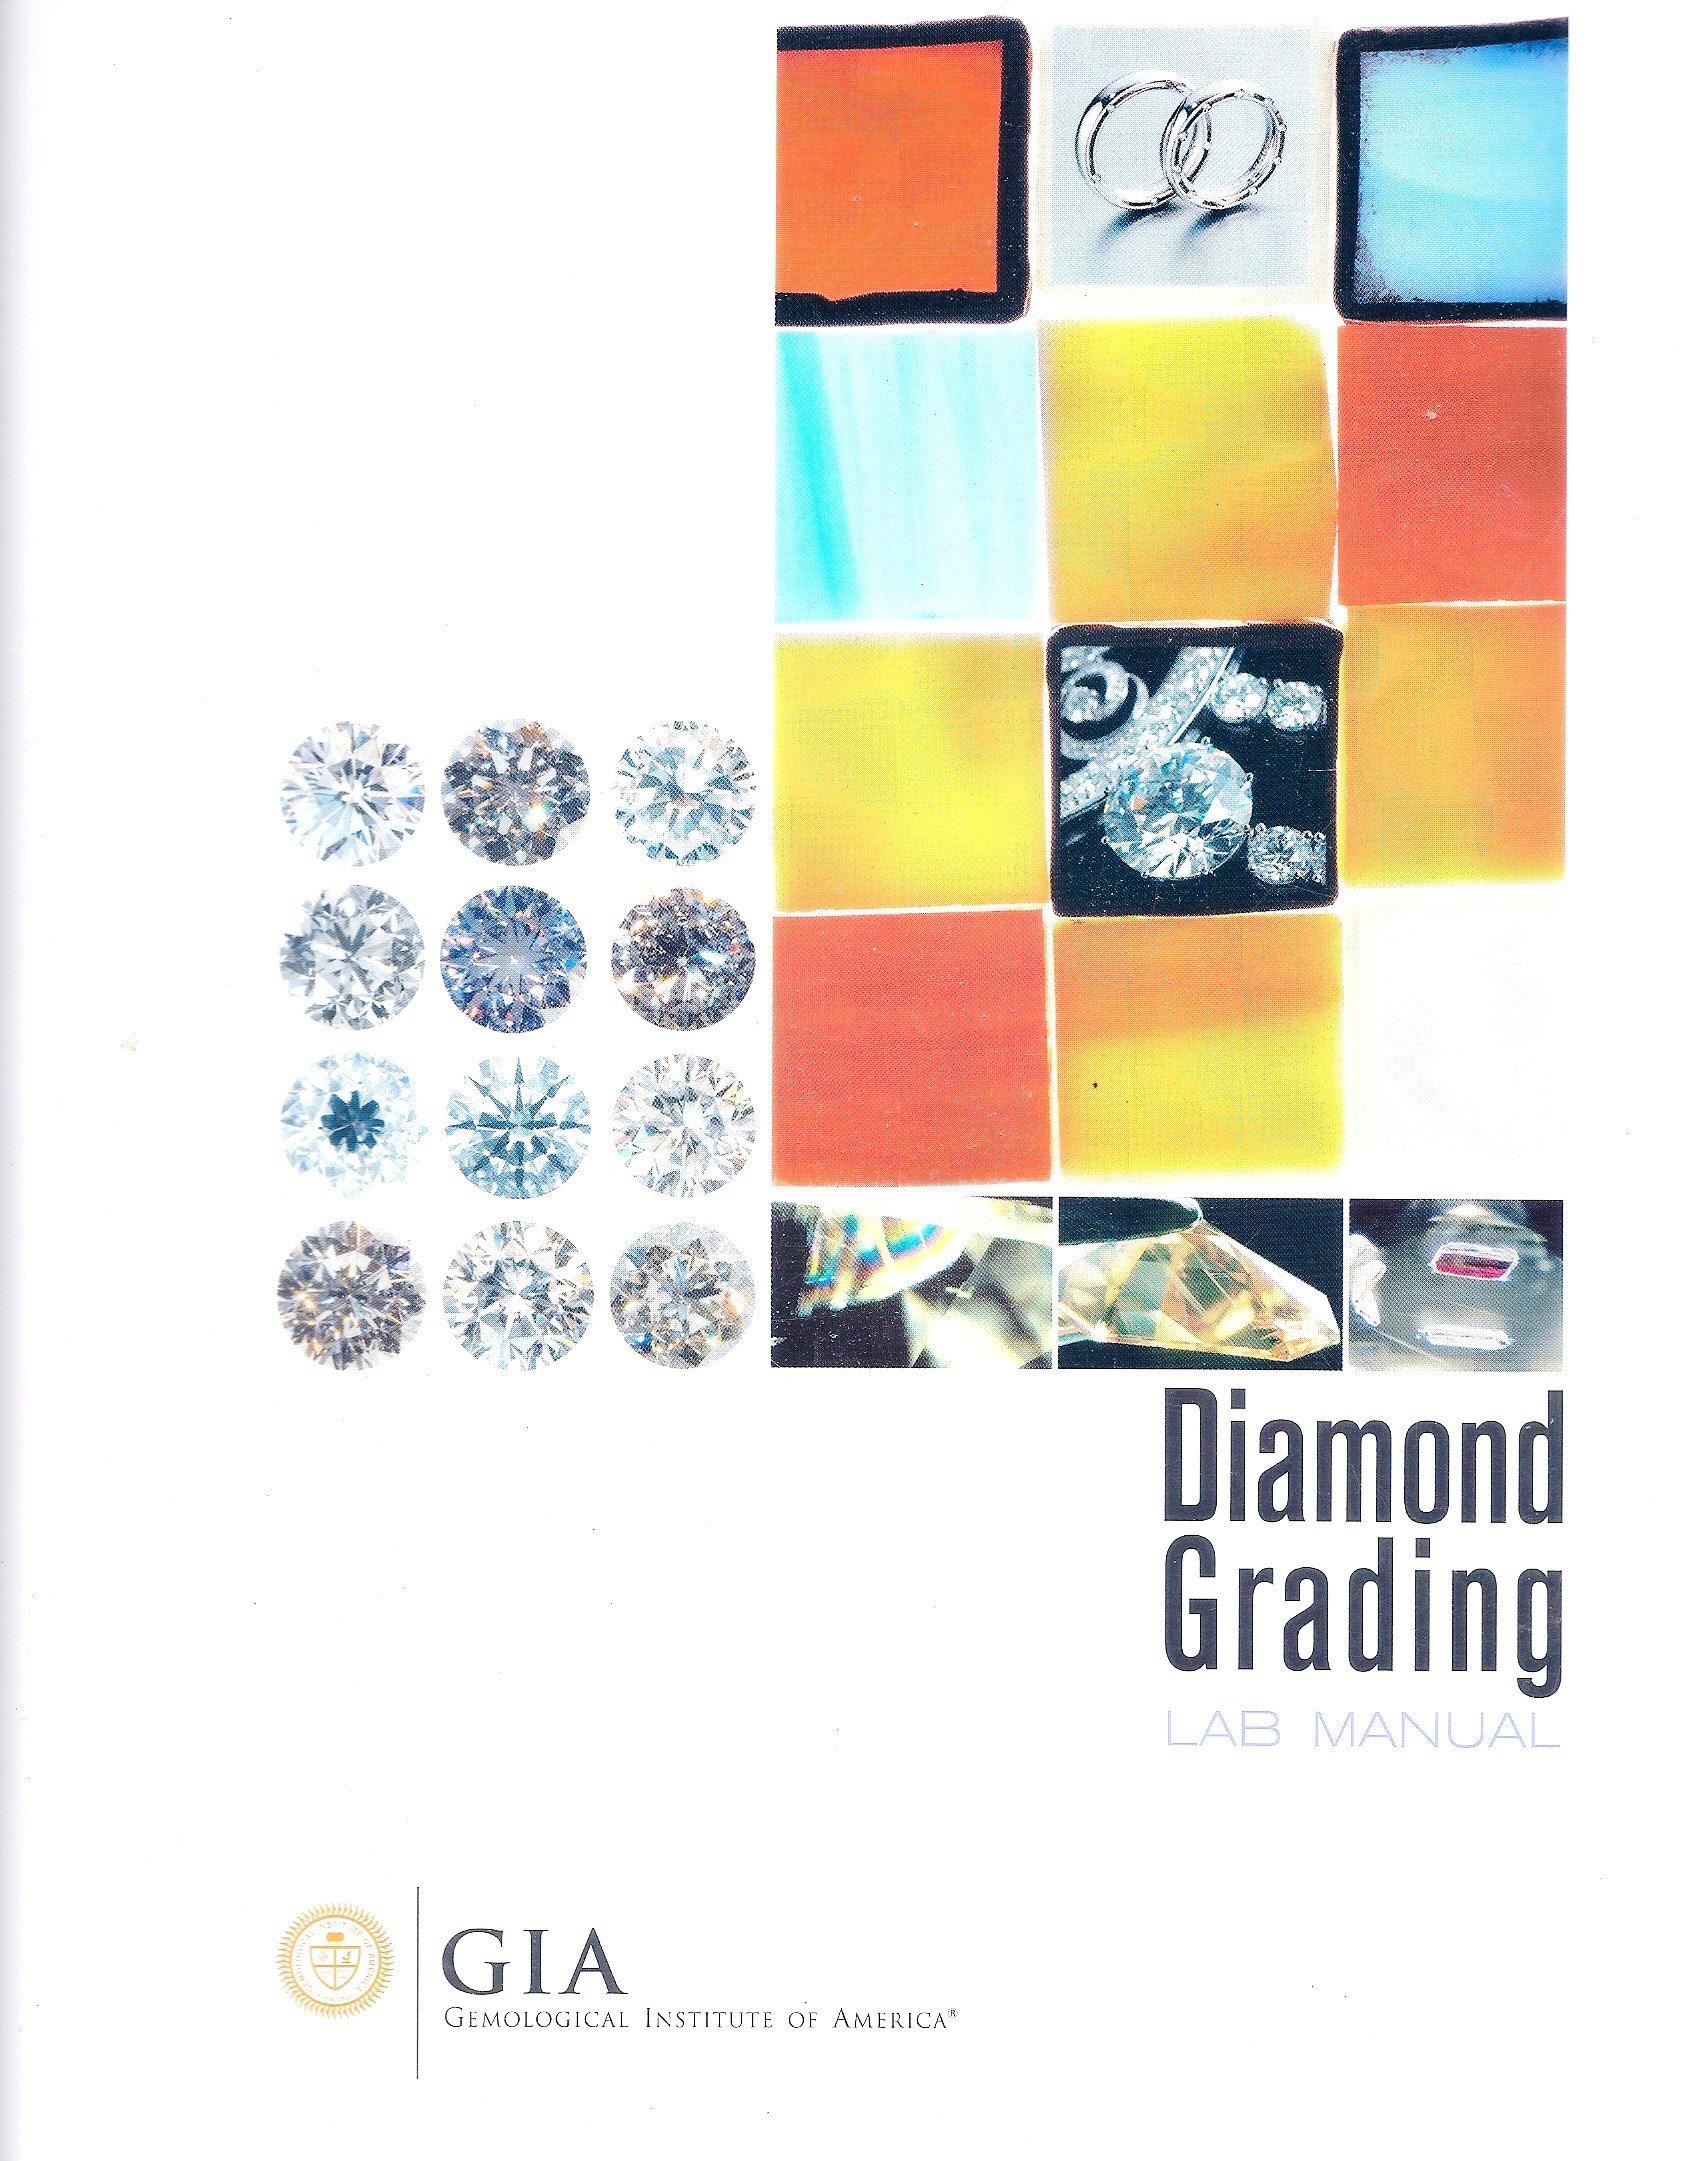 GIA Diamond Grading Lab Manual: Gemological Institute of America:  Amazon.com: Books